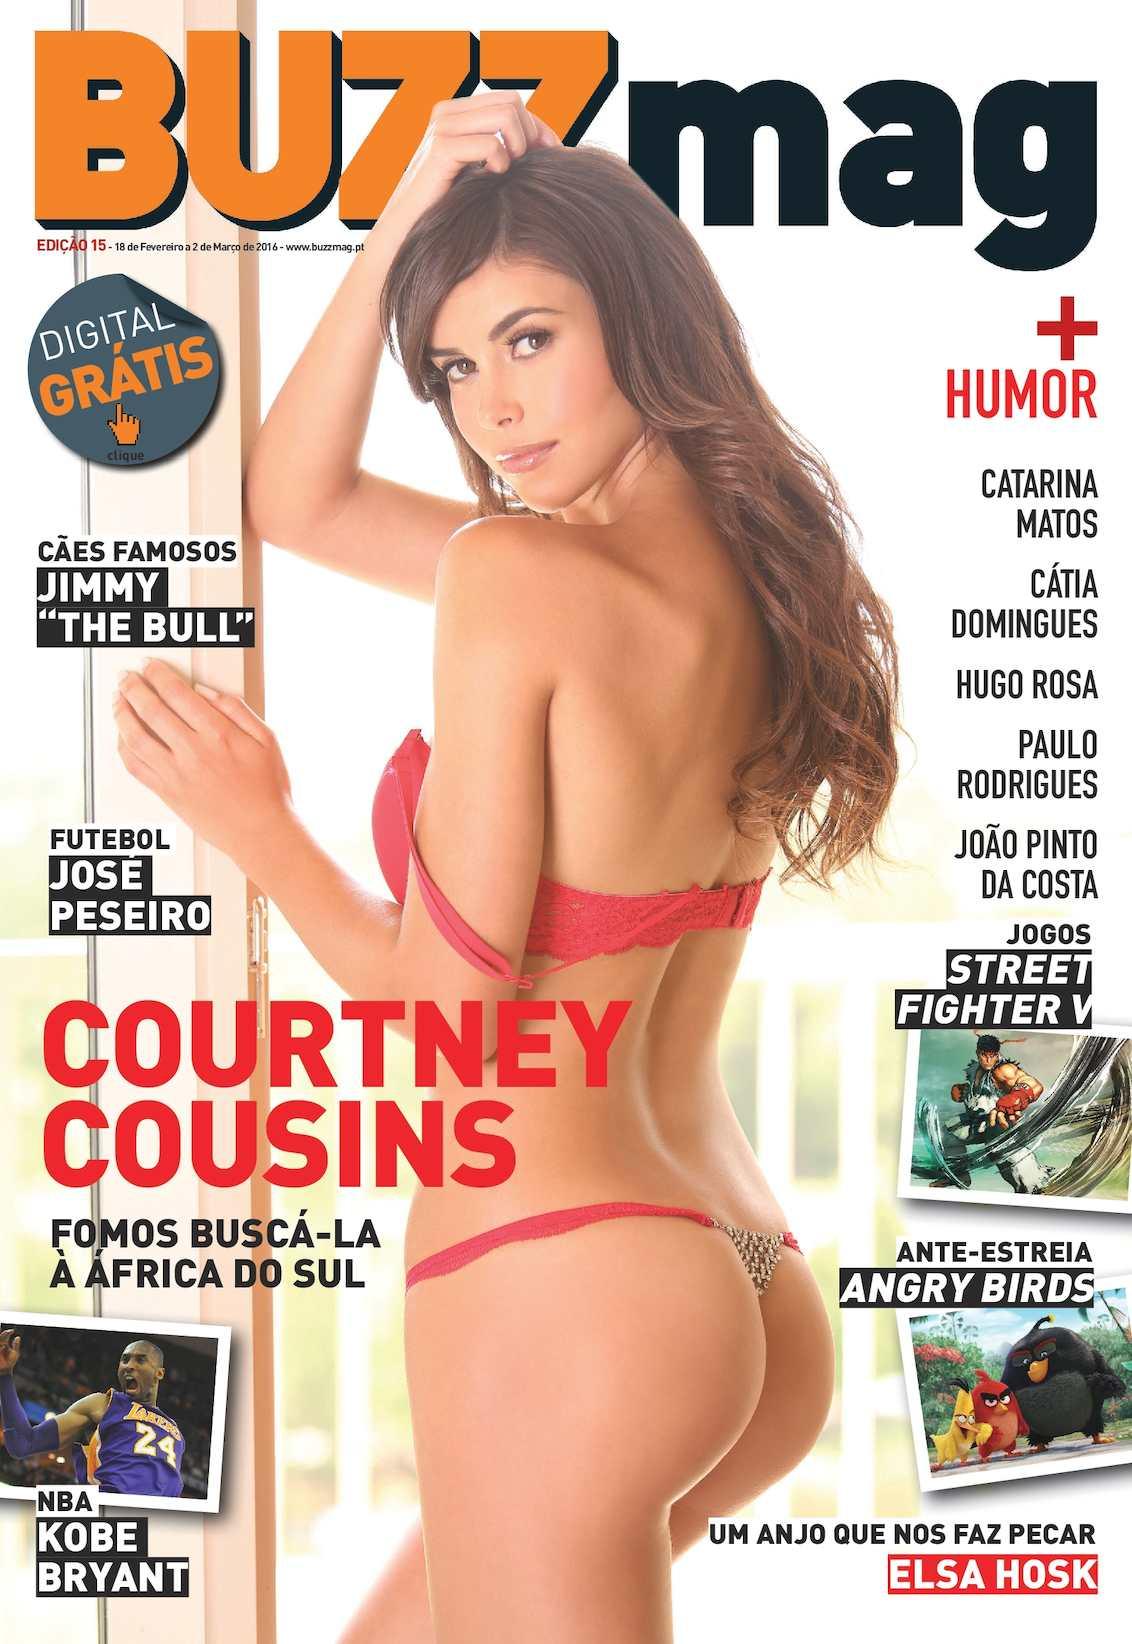 d9d1643ed Calaméo - Courtney Cousins